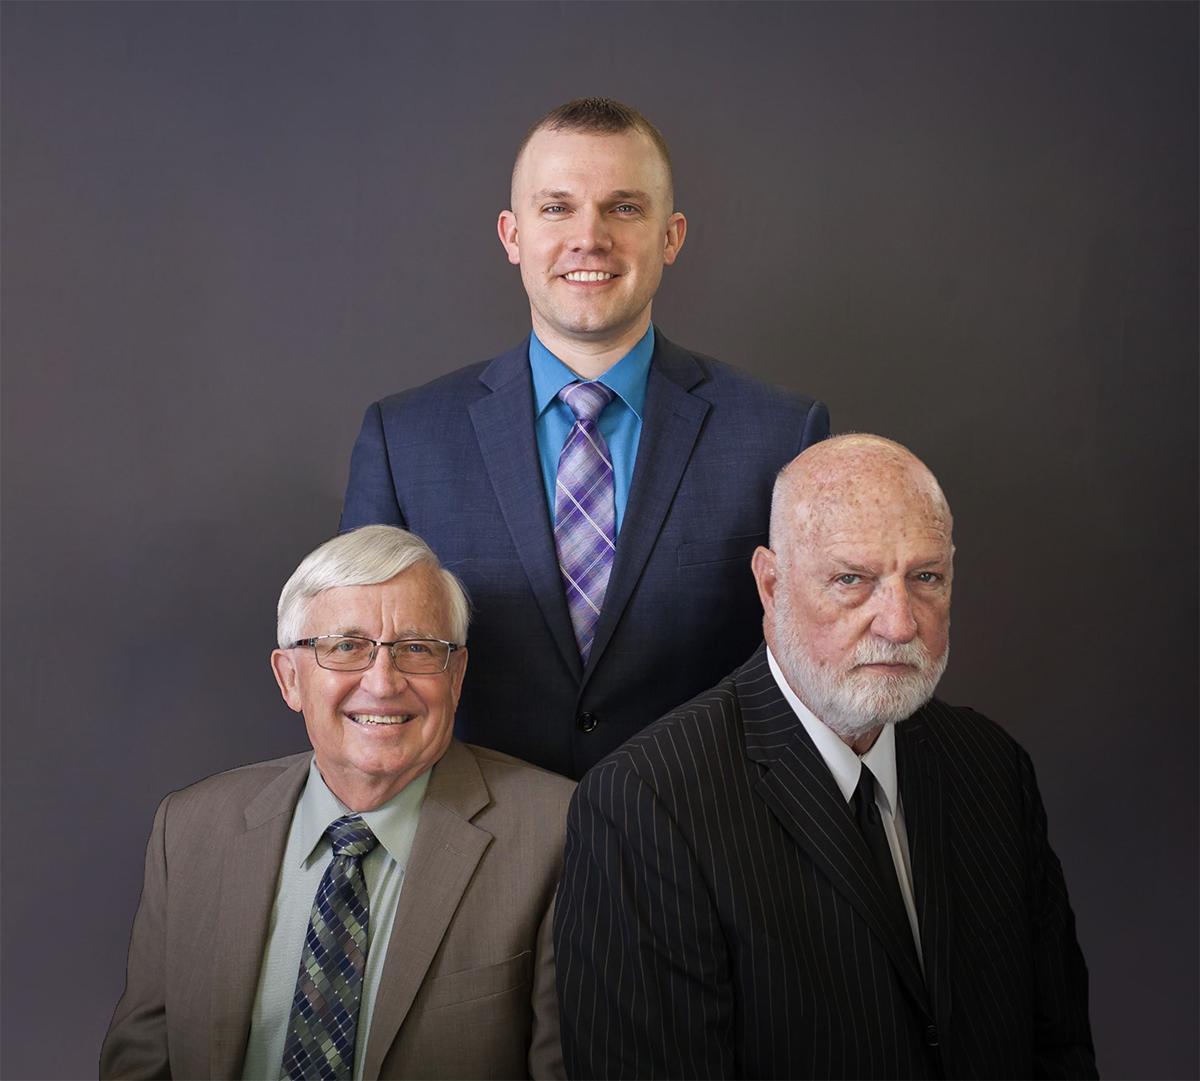 Yoder & Jessup attorneys. Kendallville, Indiana, Proudly serving Angola, Auburn, Columbia City, Kendallville, and Garrett